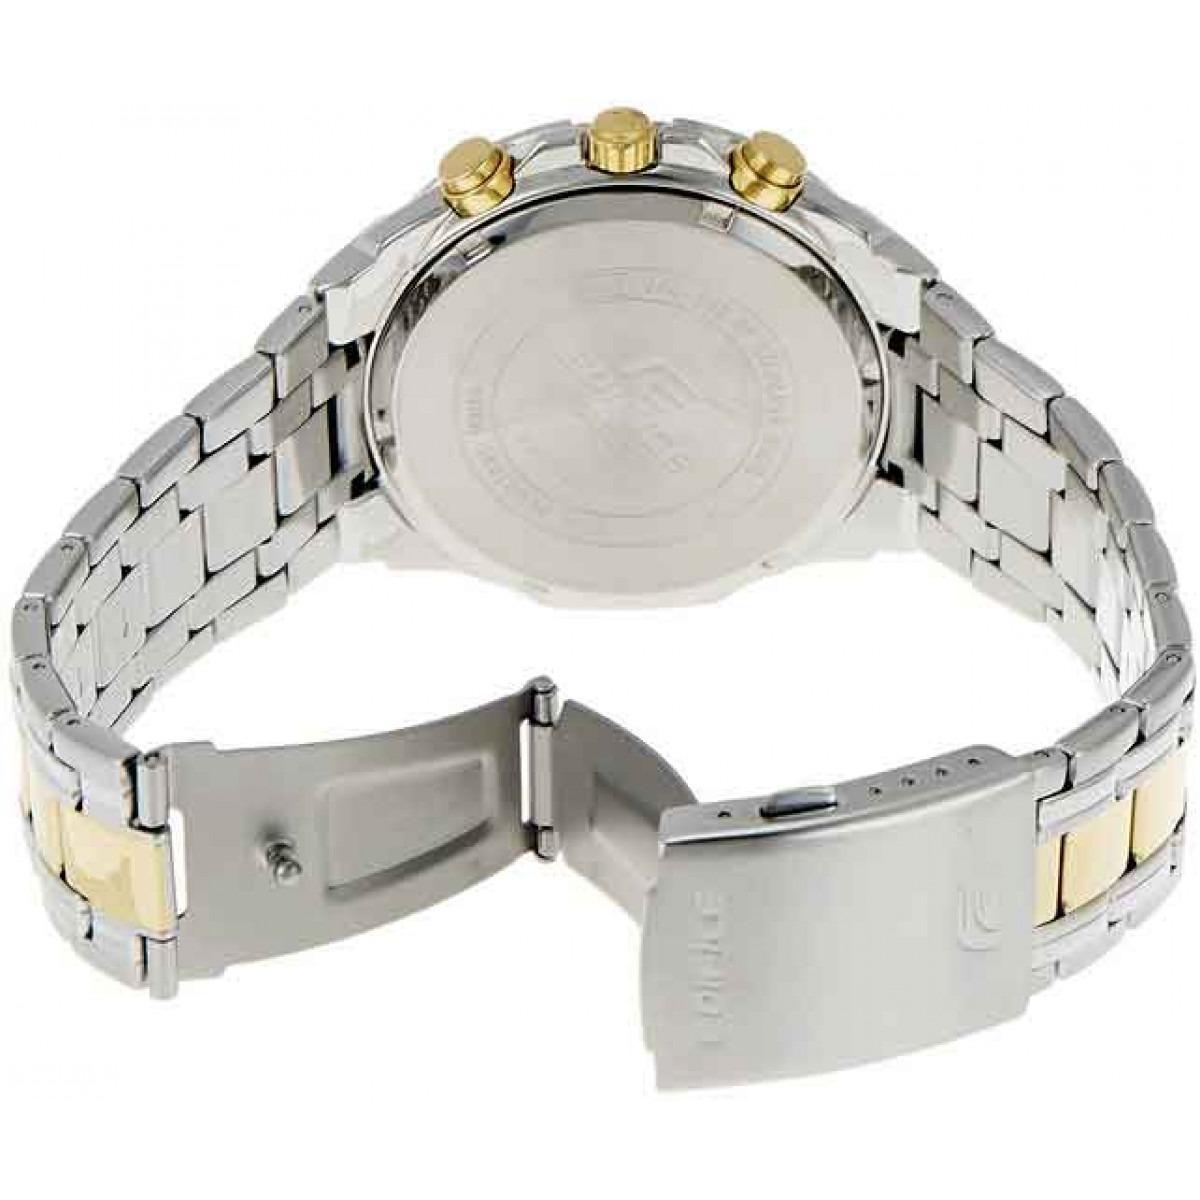 8d6145b7064 relógio casio masculino edifice ef-558d-1avudf. luxo top. Carregando zoom.